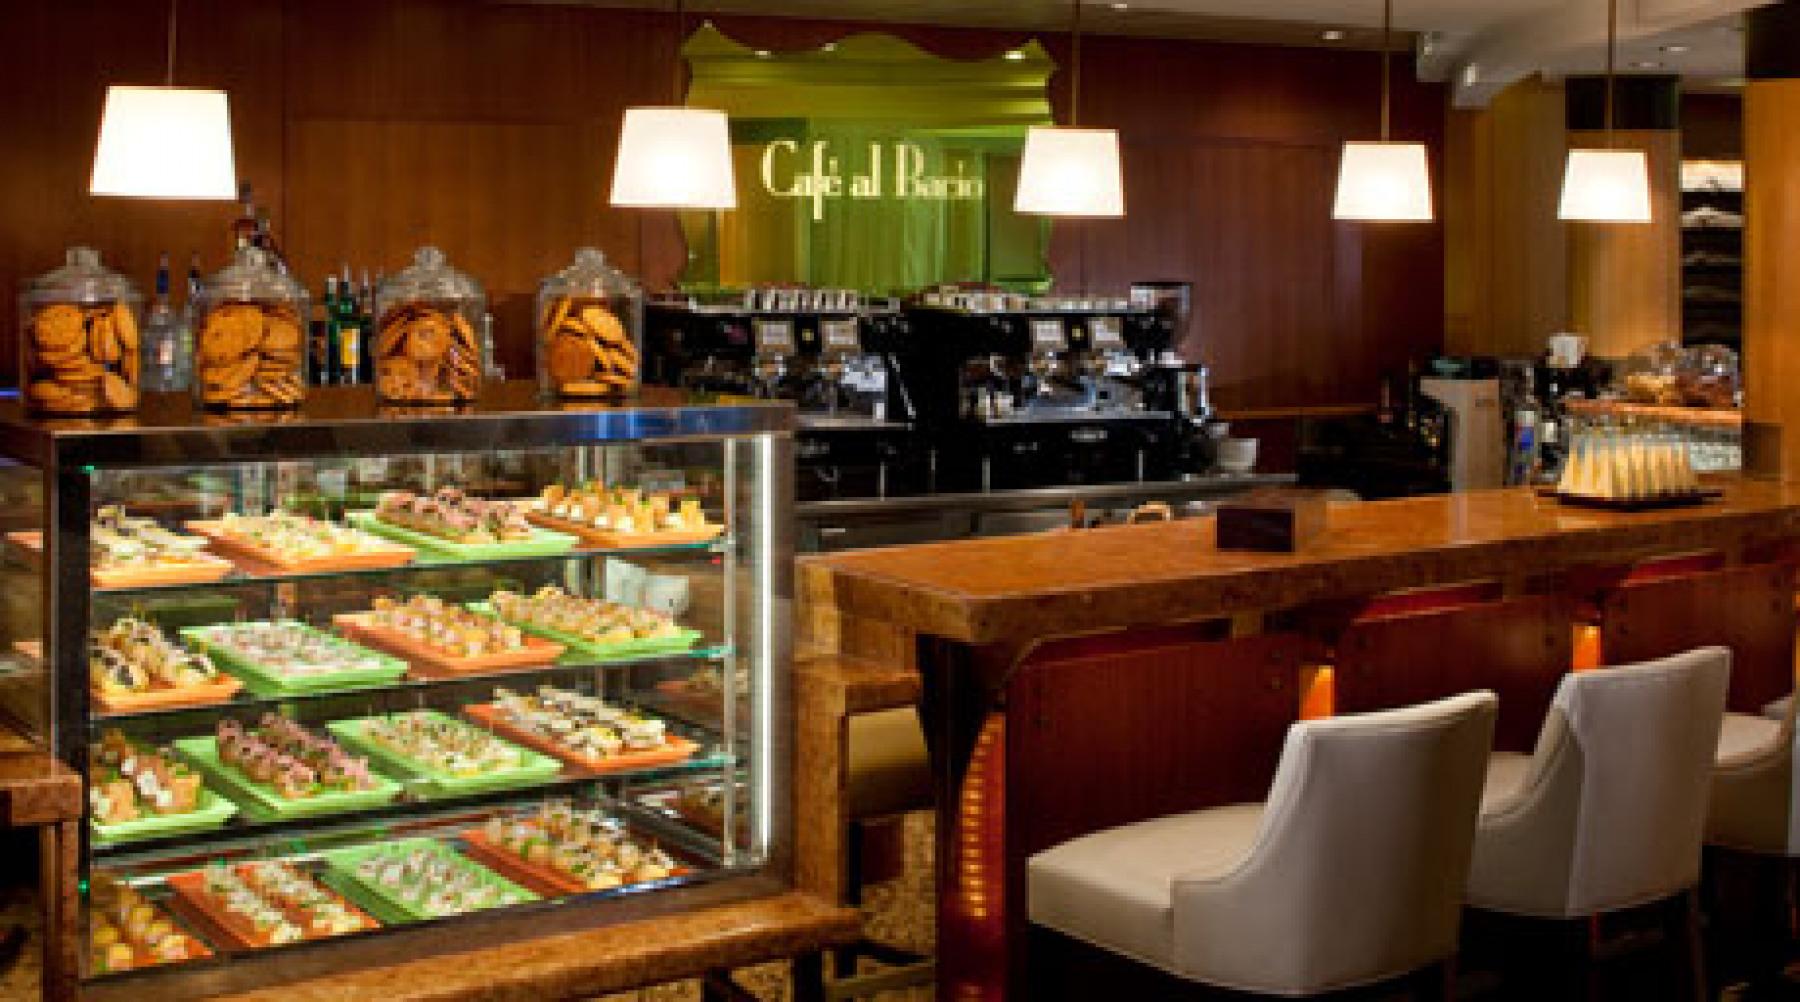 Celebrity Cruises Celebrity al Bacio & Gelateria.jpg